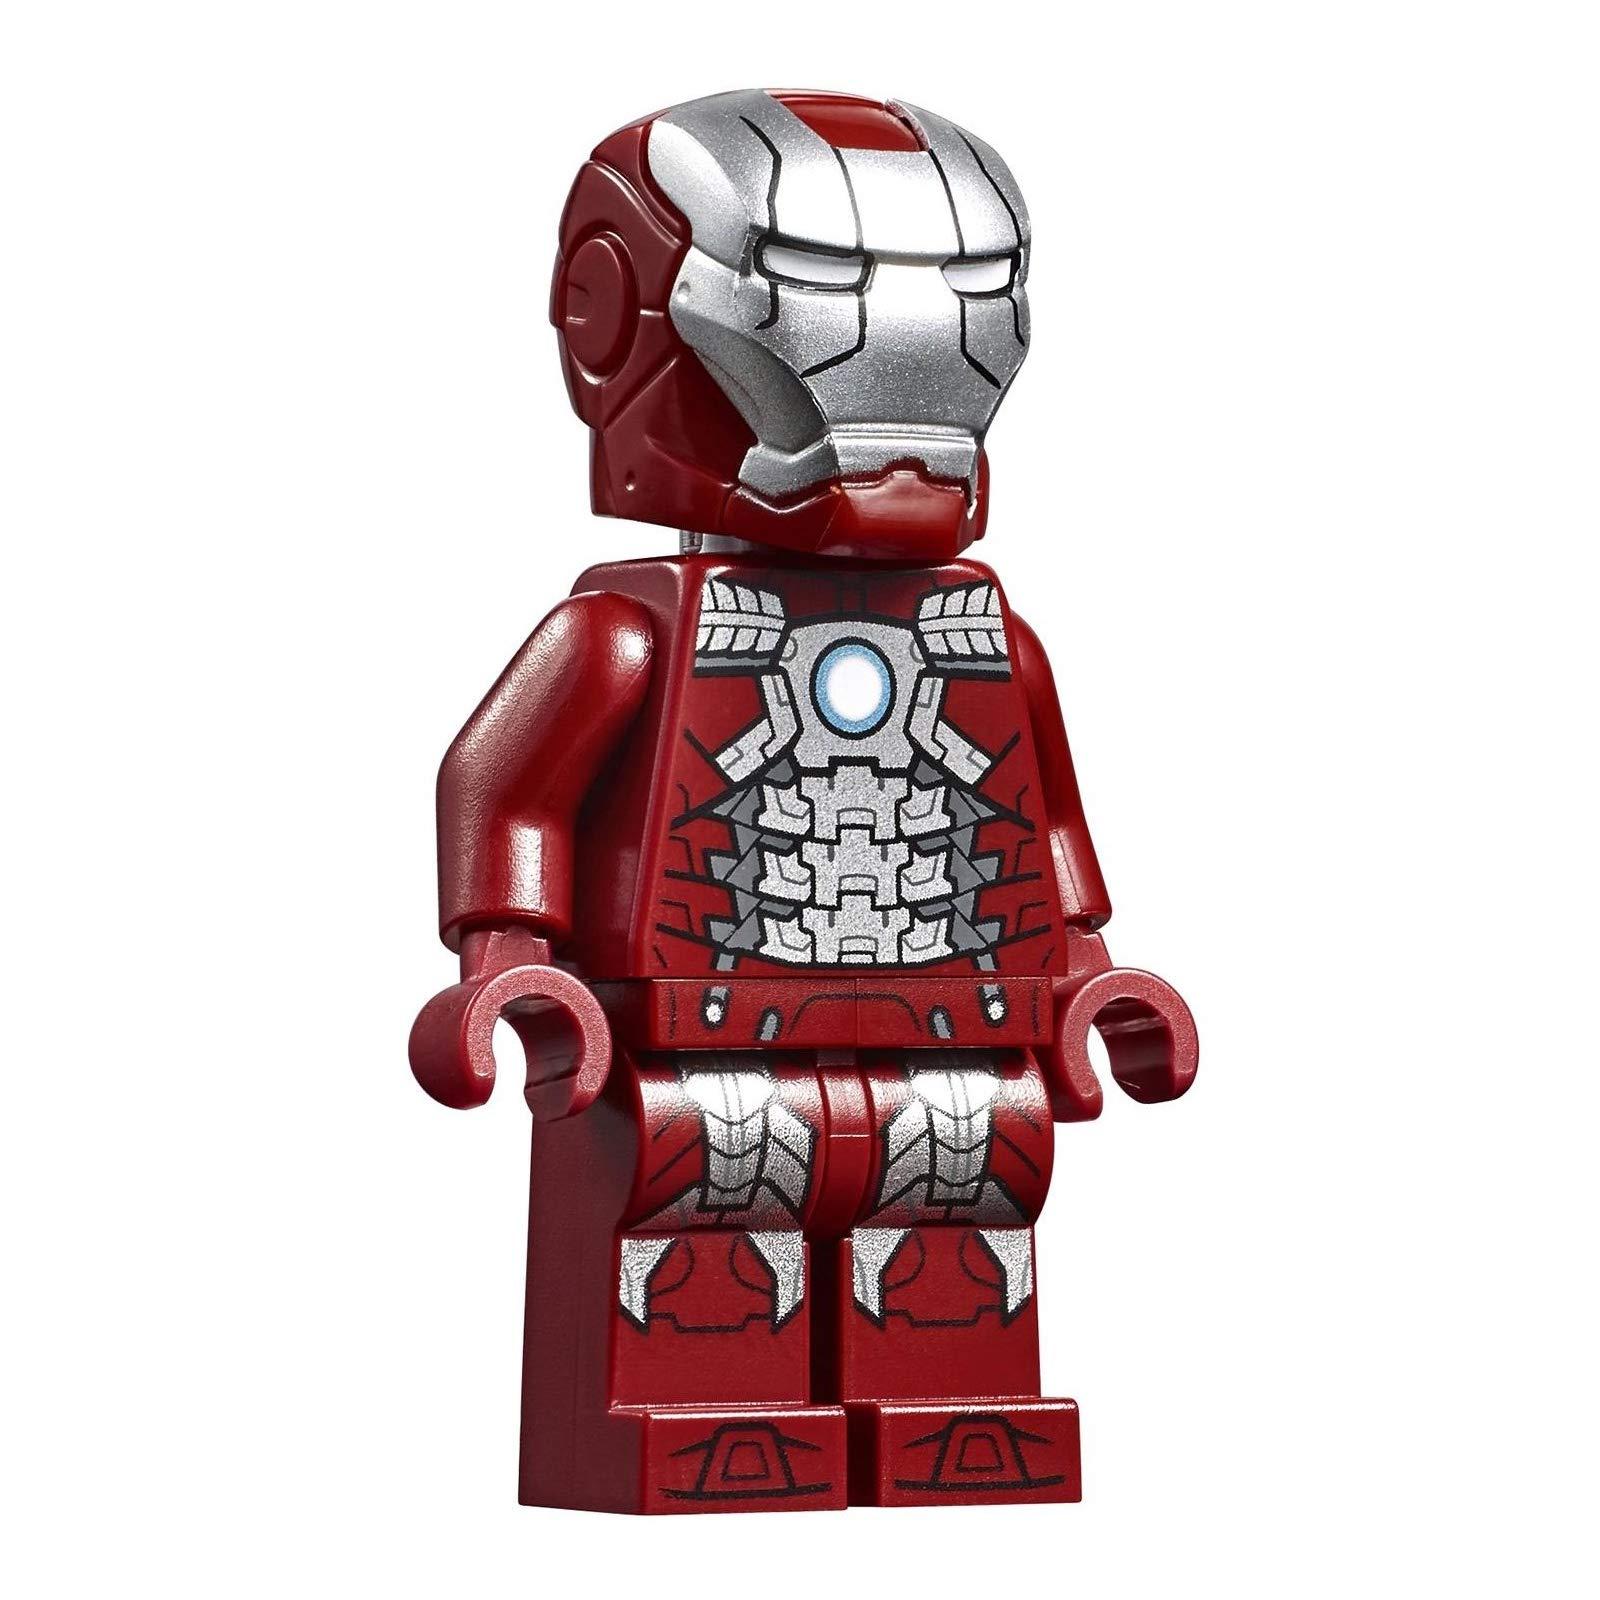 LEGO Avengers Endgame Iron Man Mark 5 Armor Minifigure 76125 Mini Fig